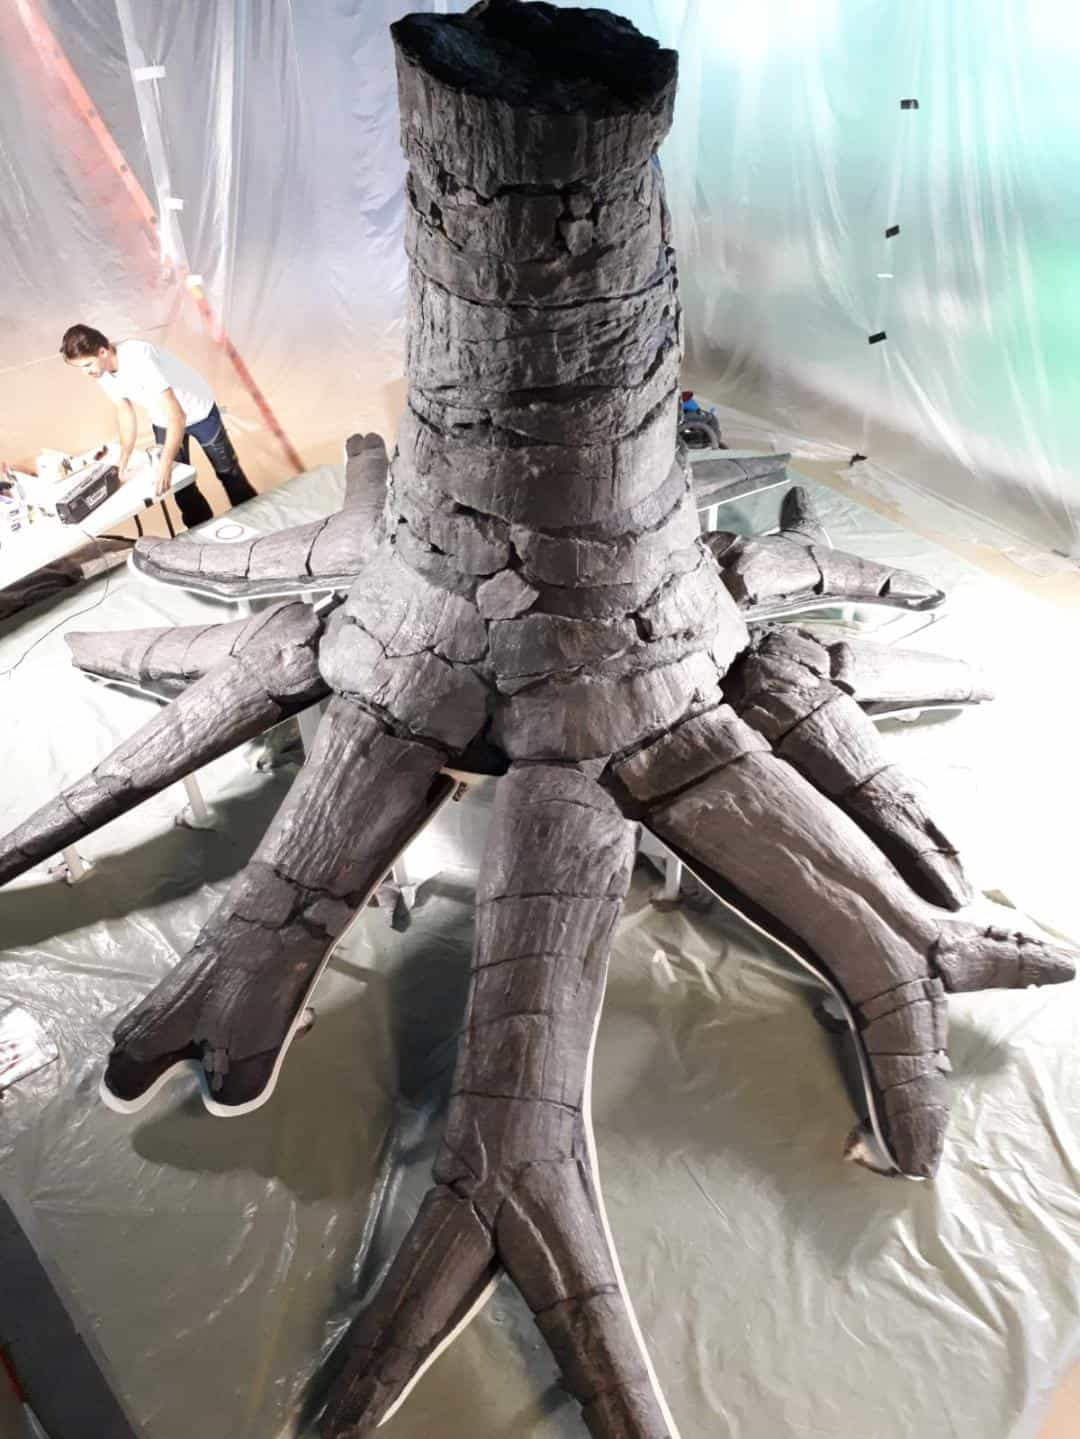 Fossils & Dinosaurs   Re-assembling the Carbon Tree   Bergbaumuseum Bochum, Germany